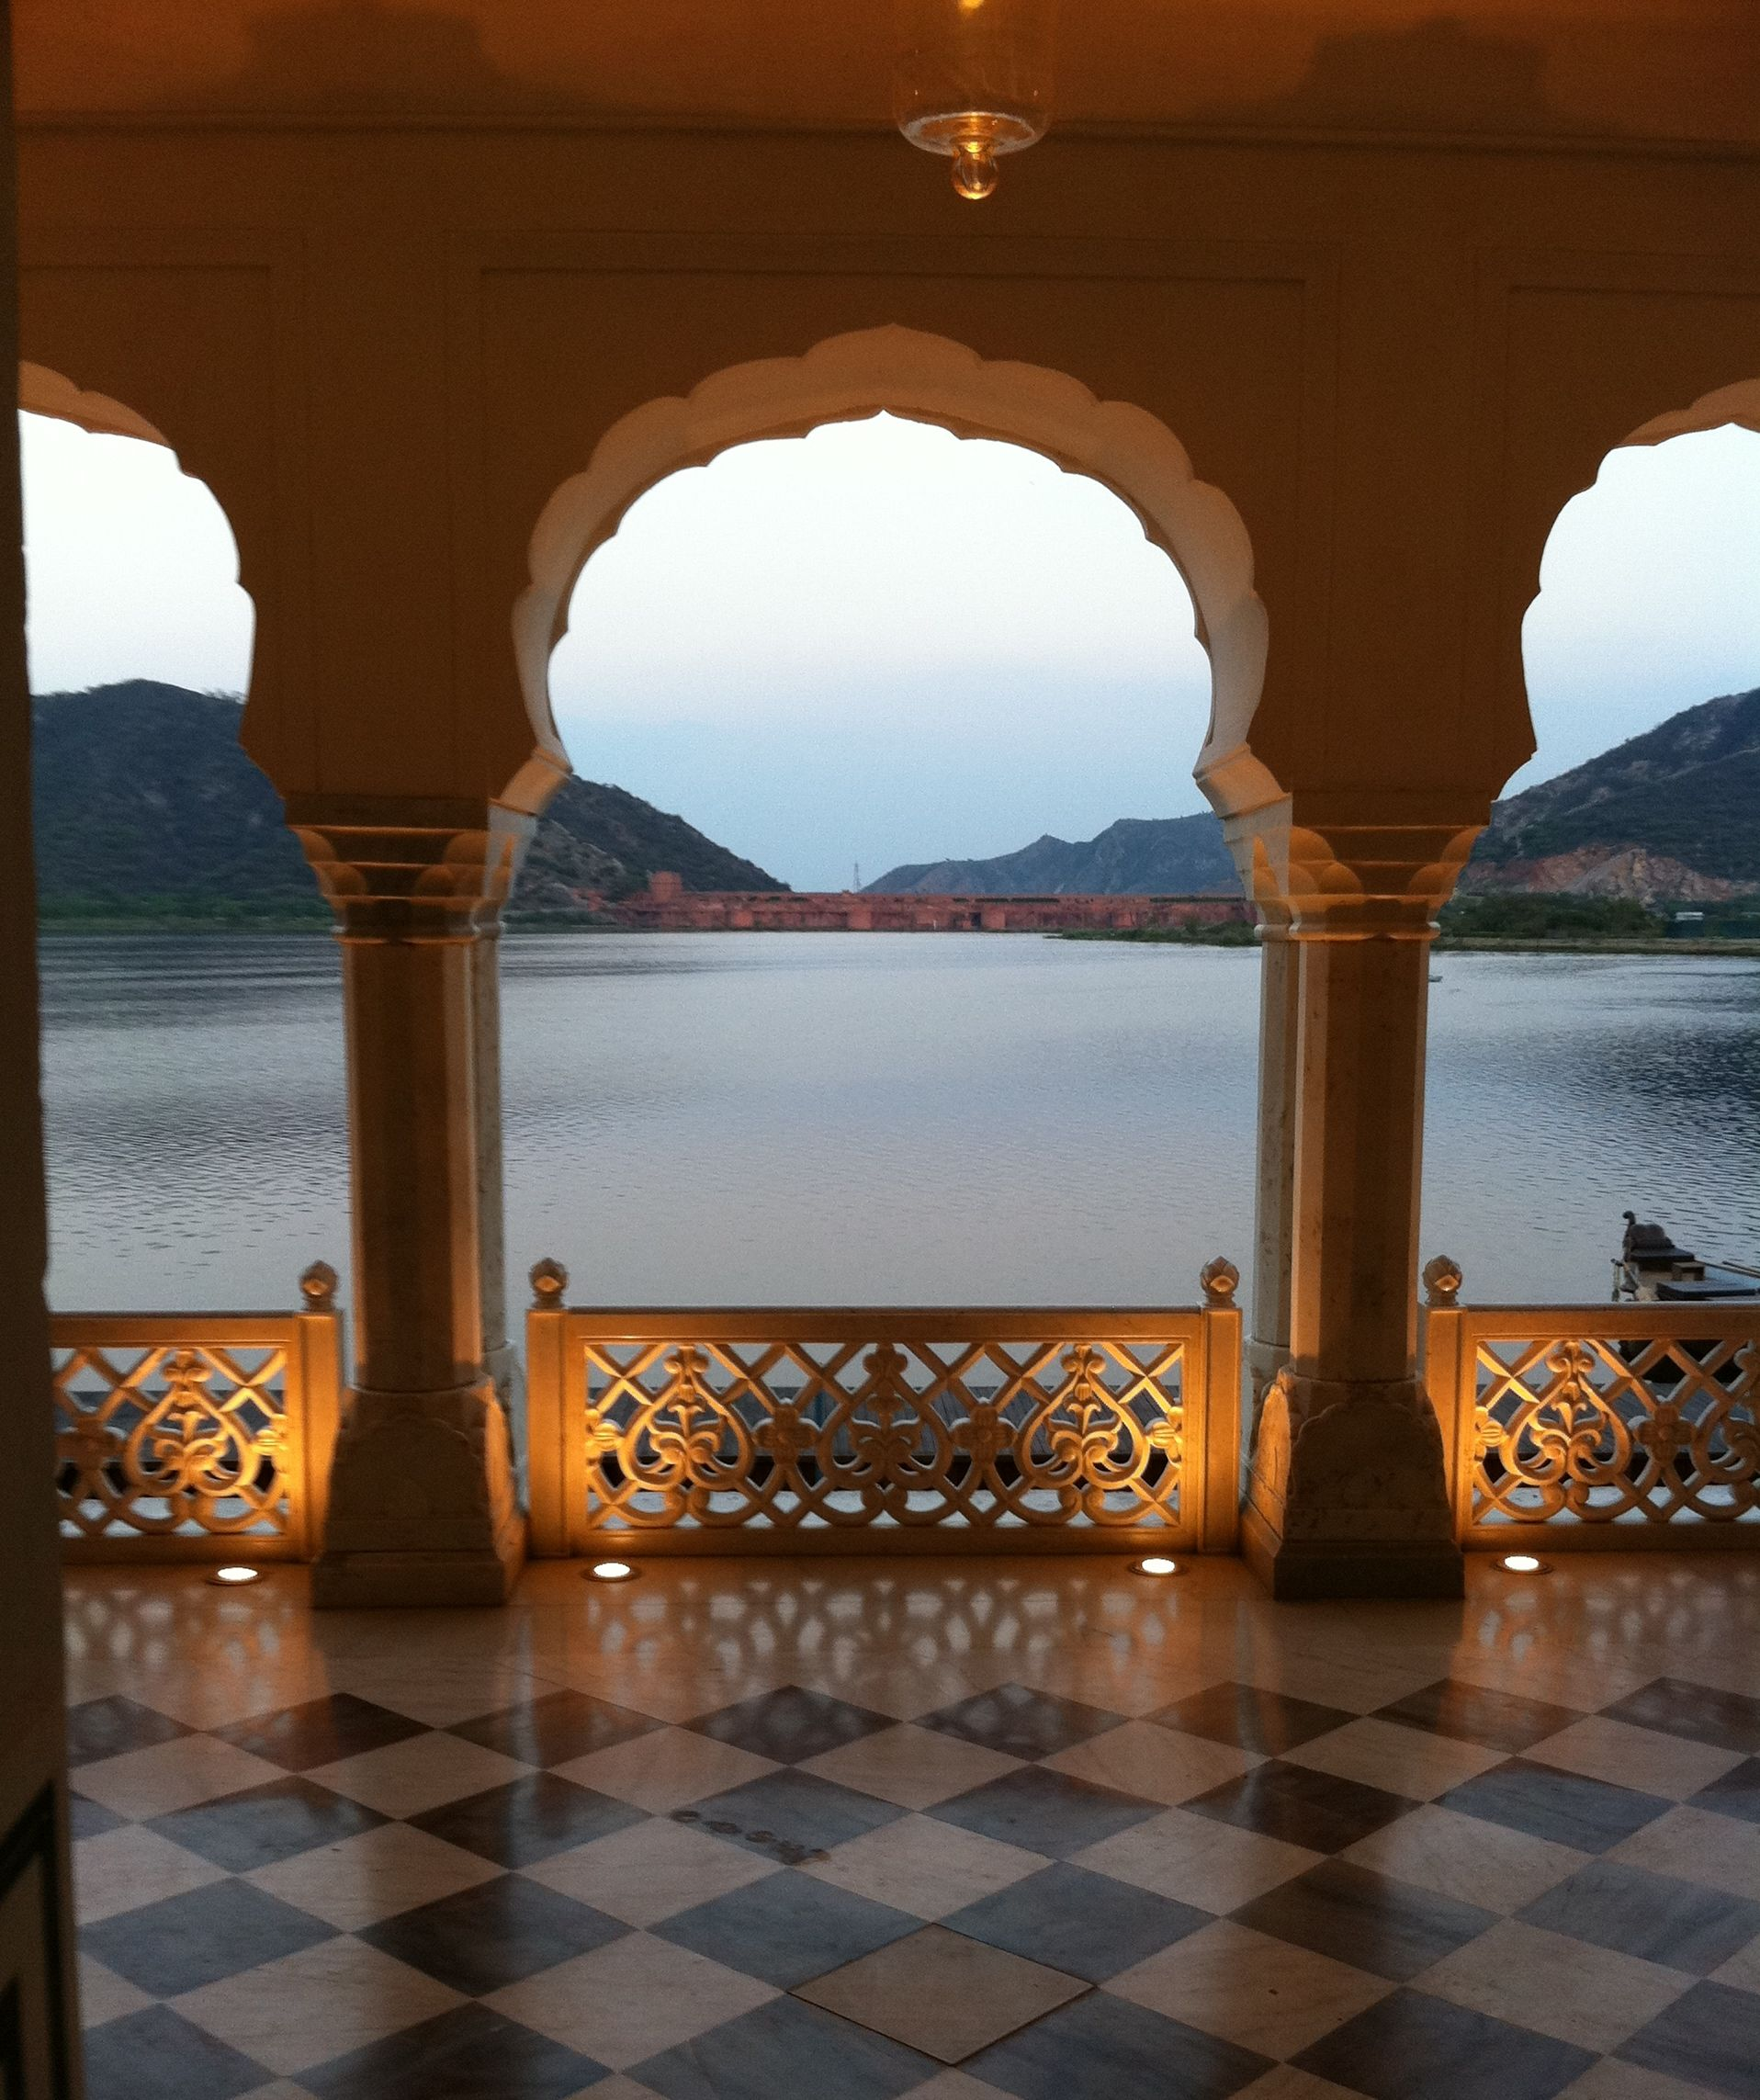 Jal mahal water palace hindu palace jaipur rajasthan for Decor india jaipur